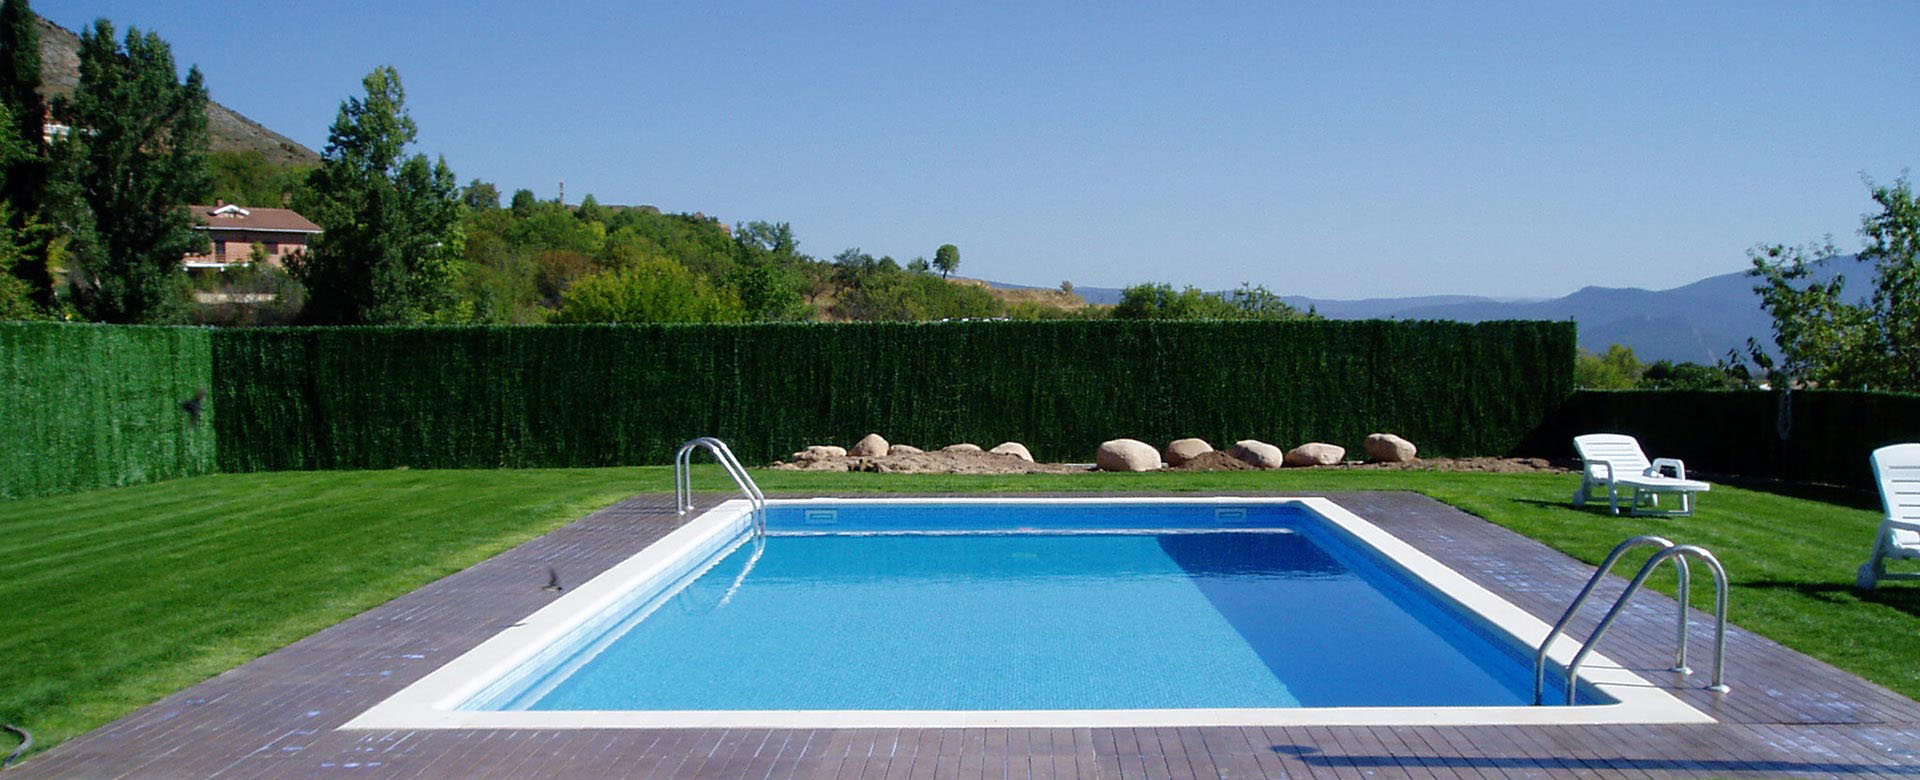 portada_piscina_1